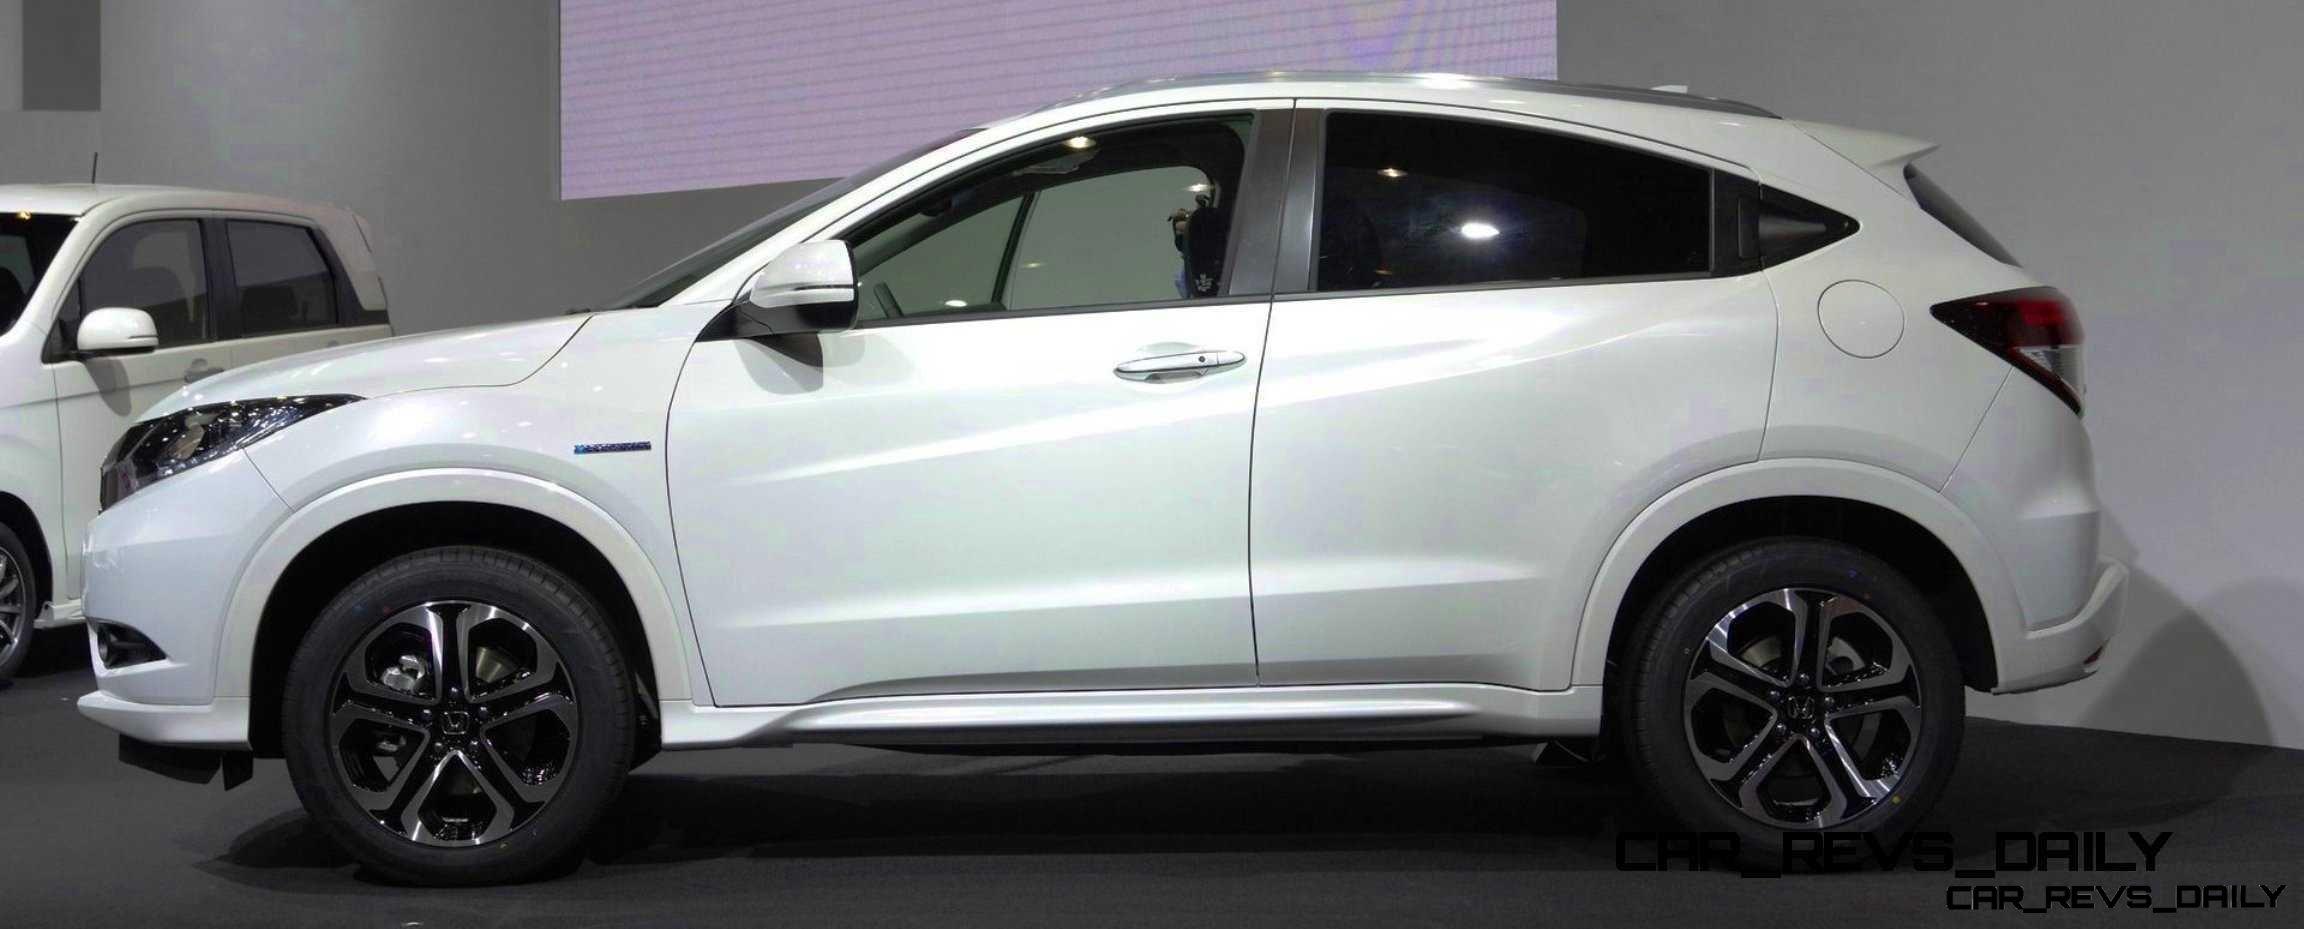 Cool-2015-Honda-Vezel-Hybrid-Previews-Spring-2014-Civic-CUV2.jpg